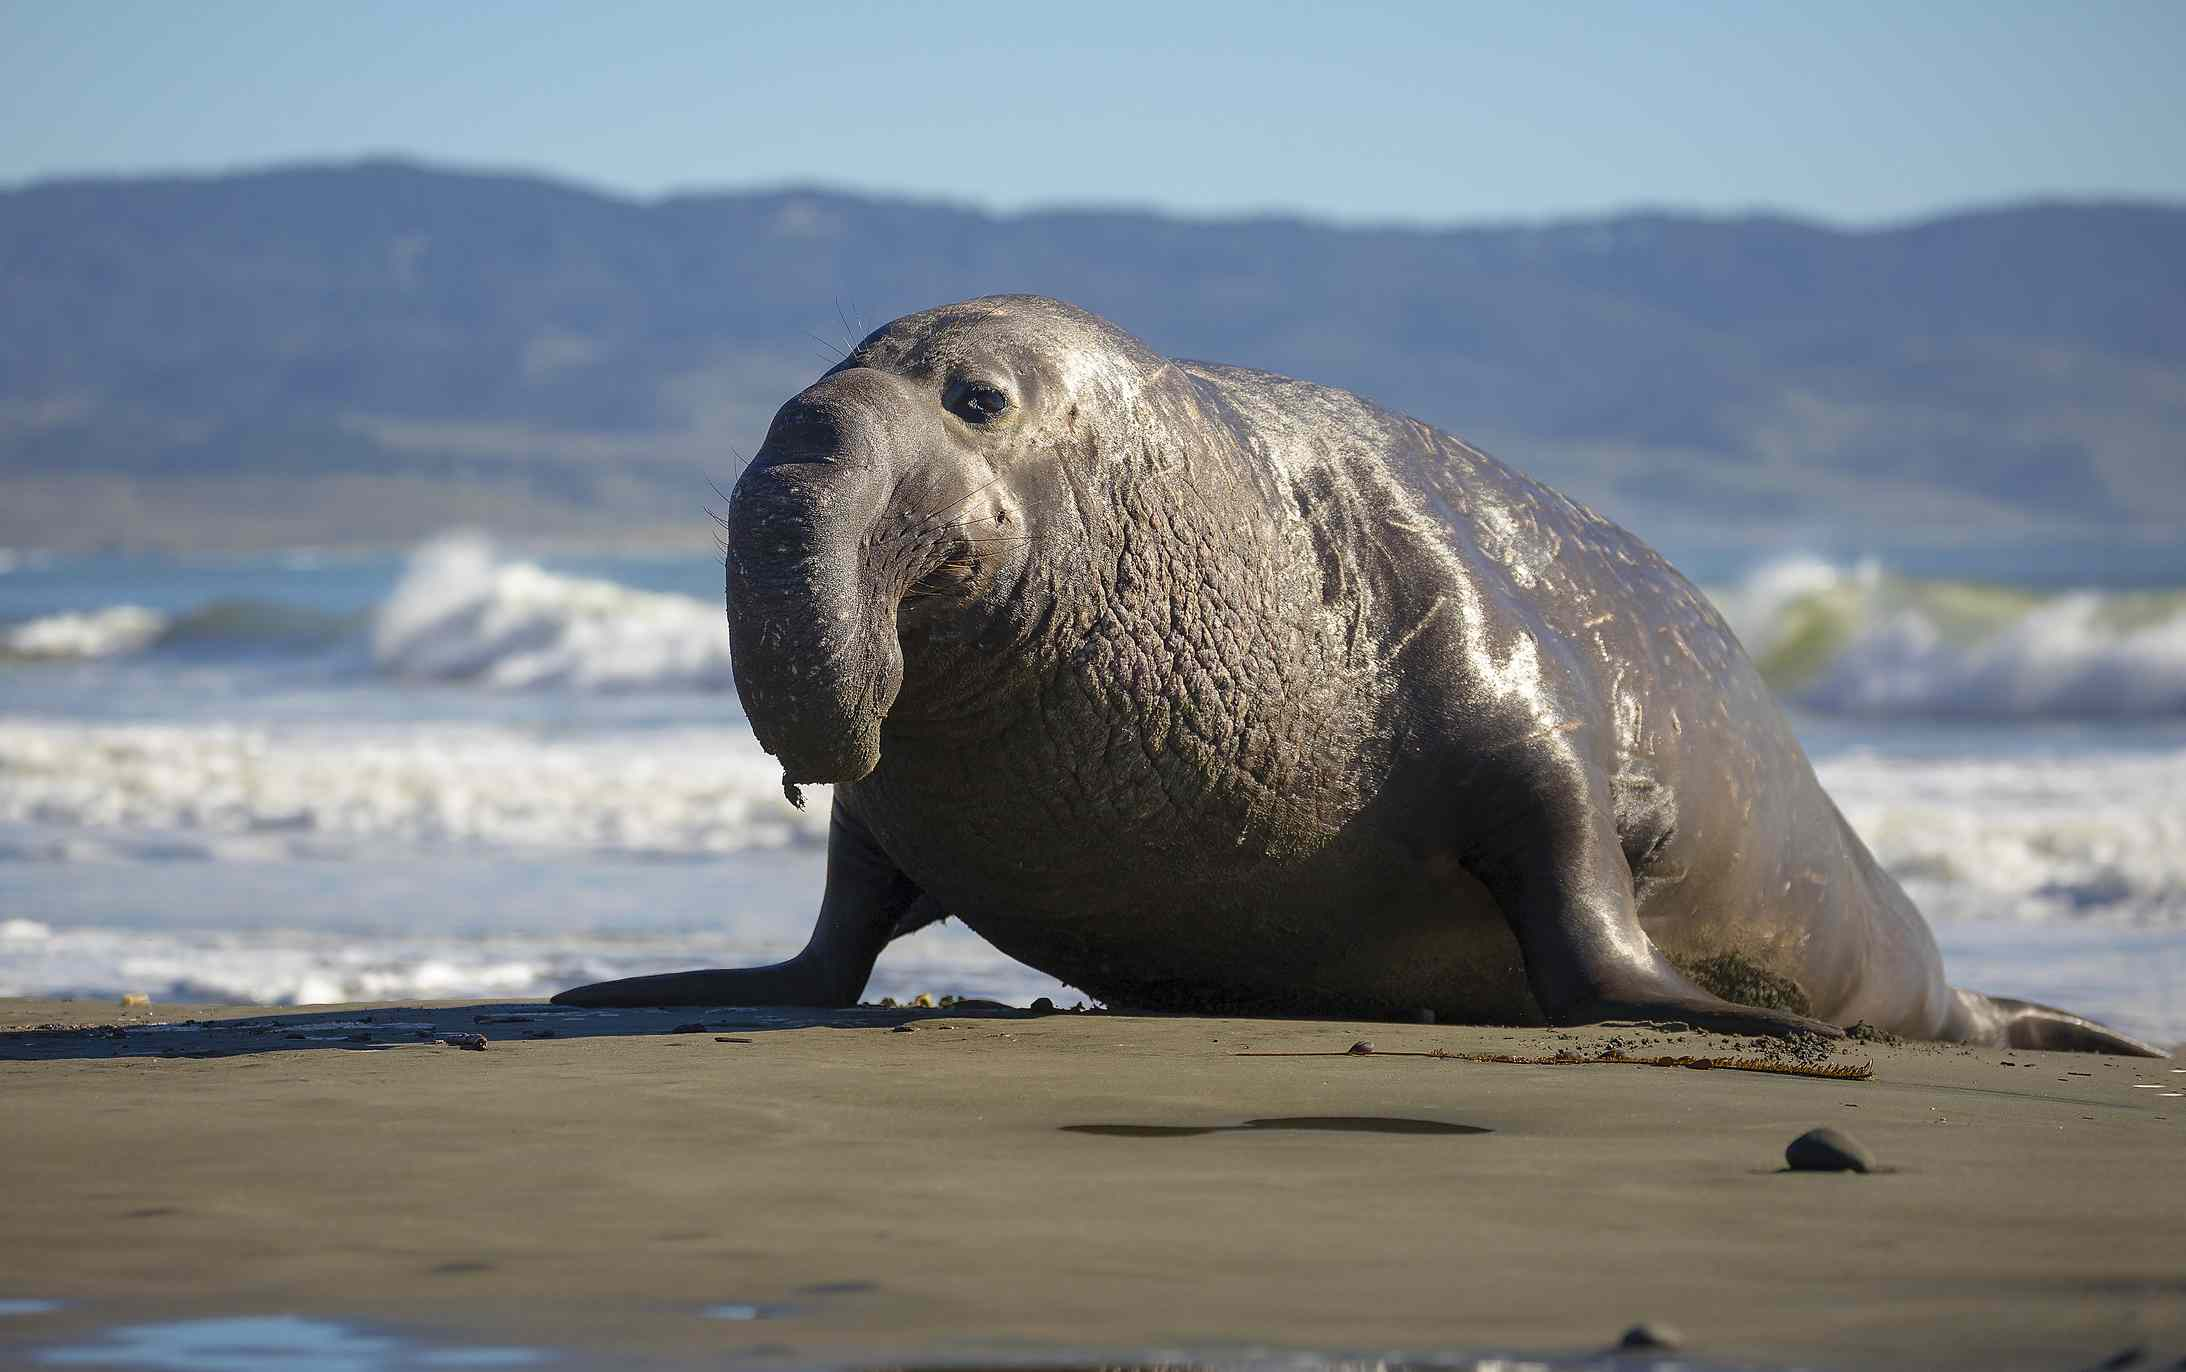 large elephant seal on sandy beach